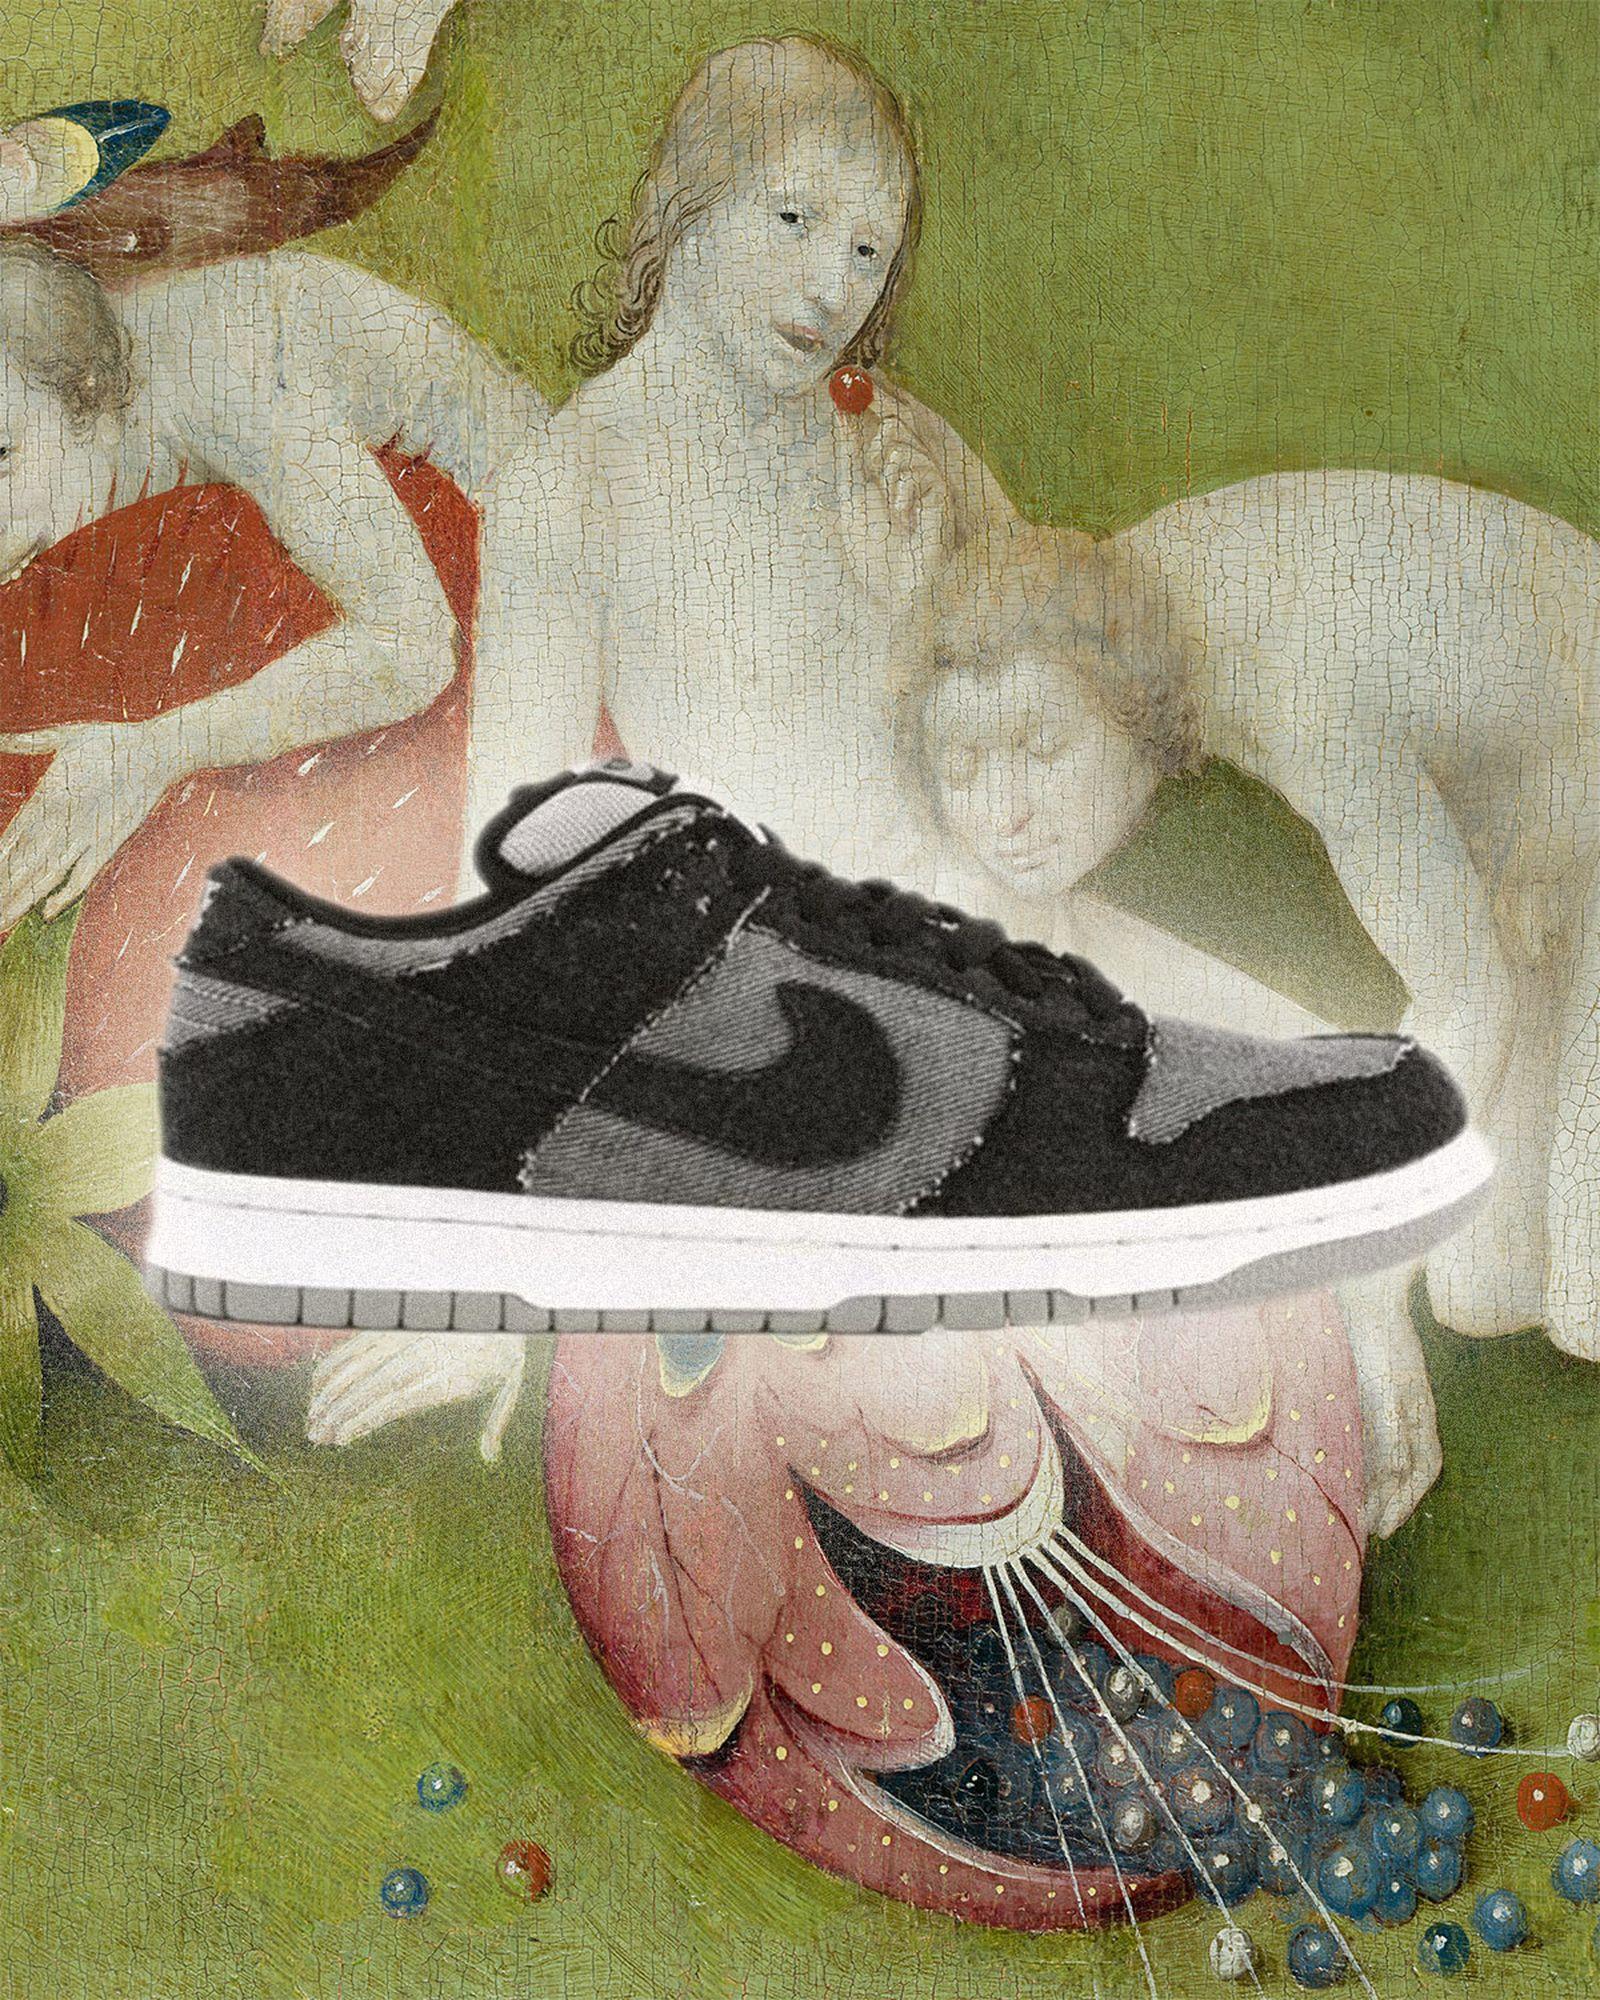 Nike-SB-Dunk-Low-Medicom-2